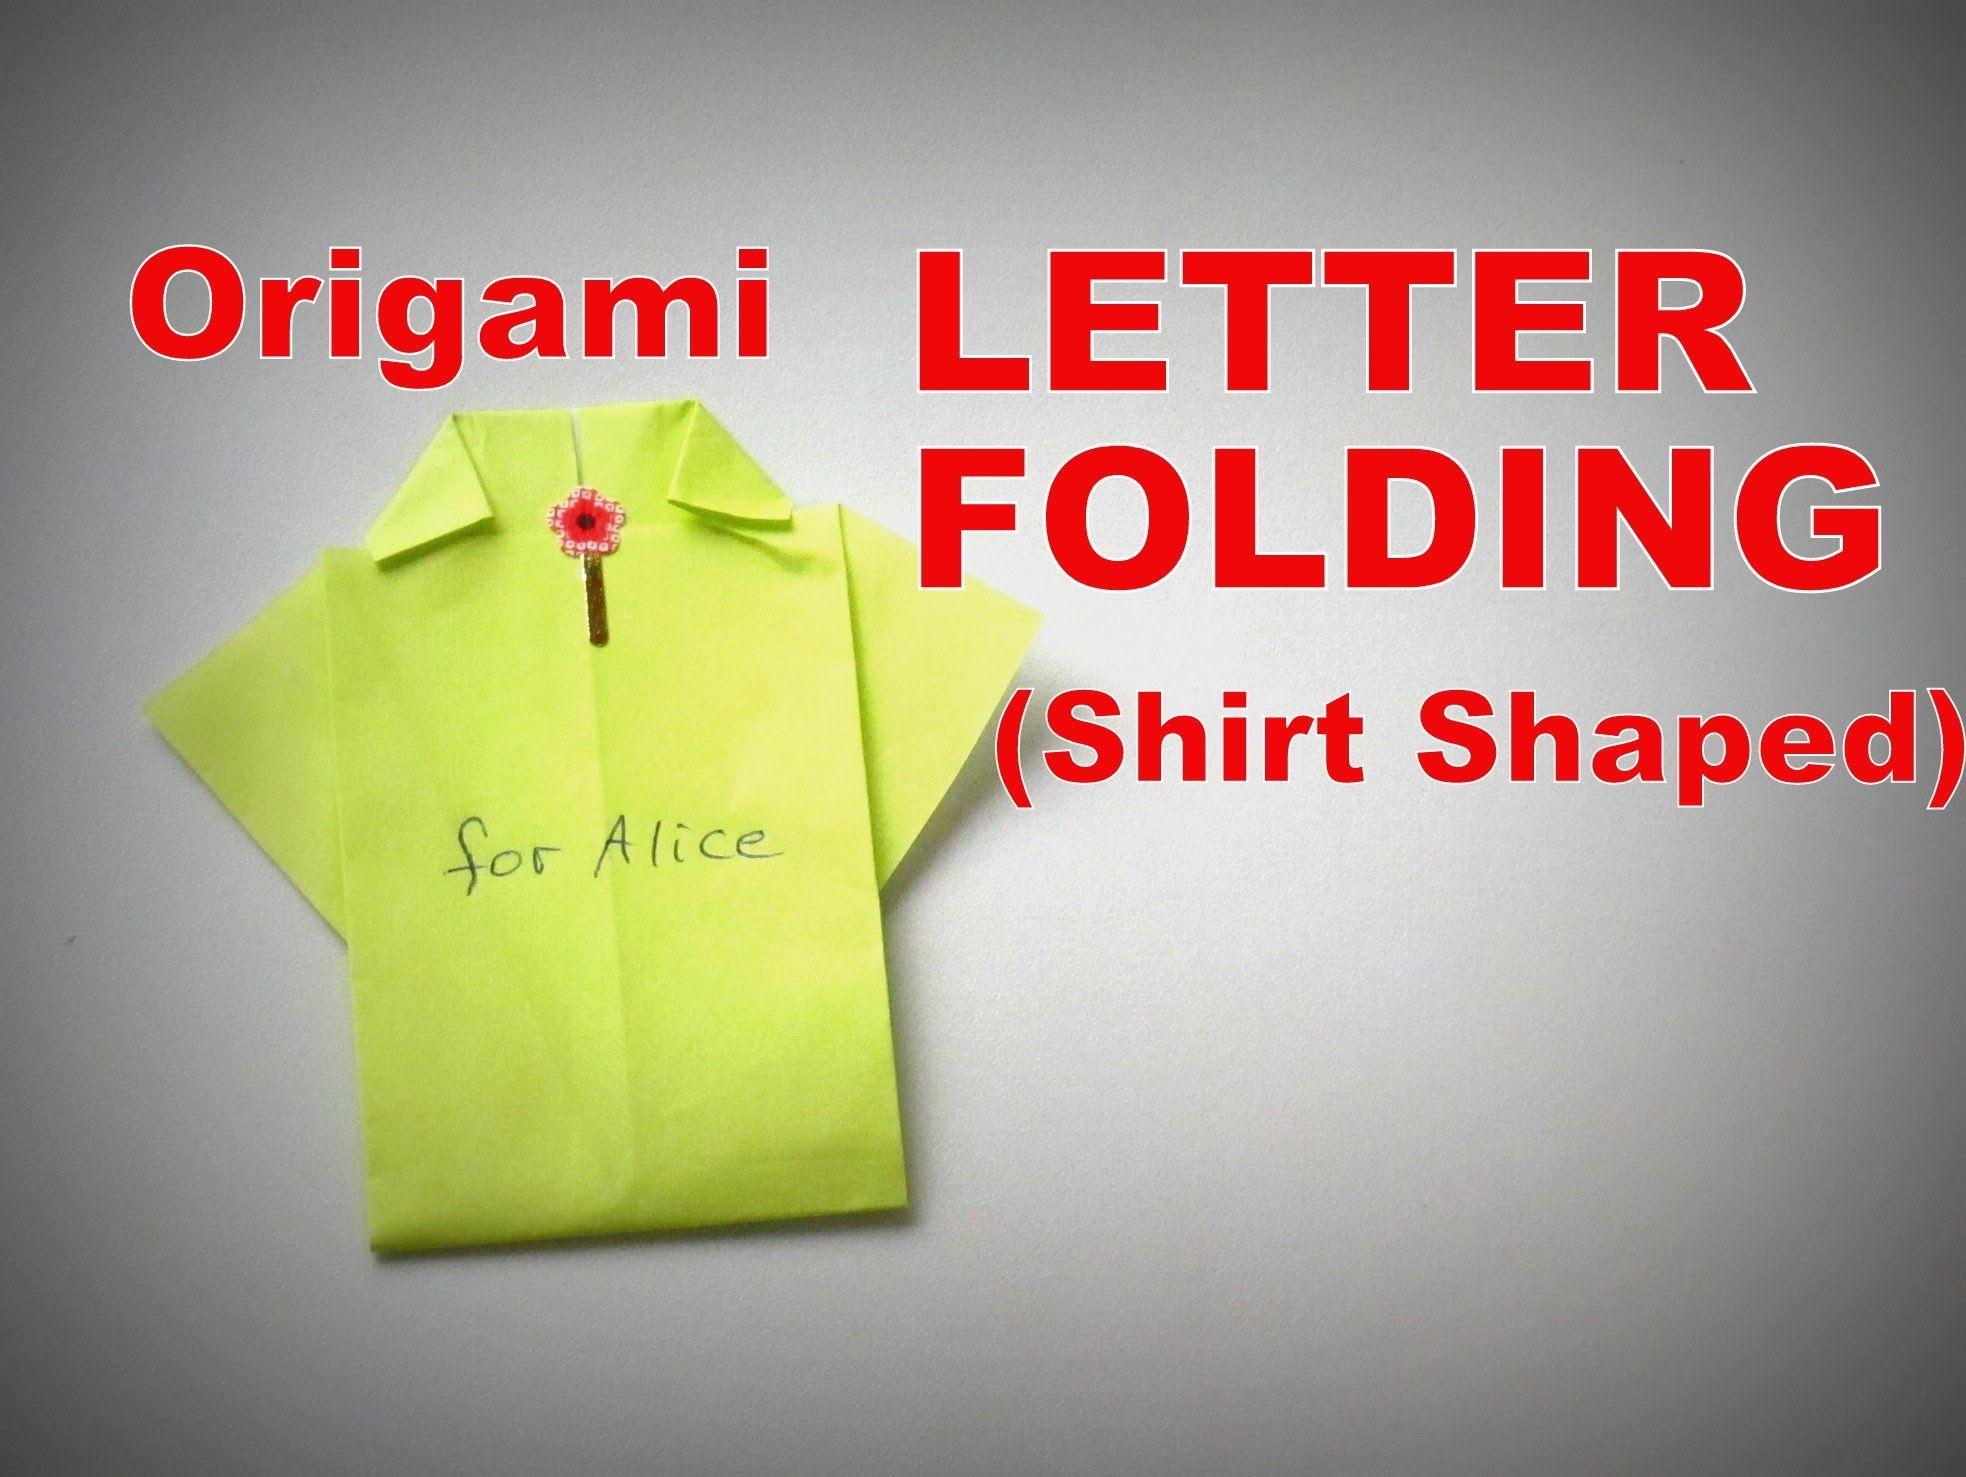 25 Origami Letter K Folding Instructions